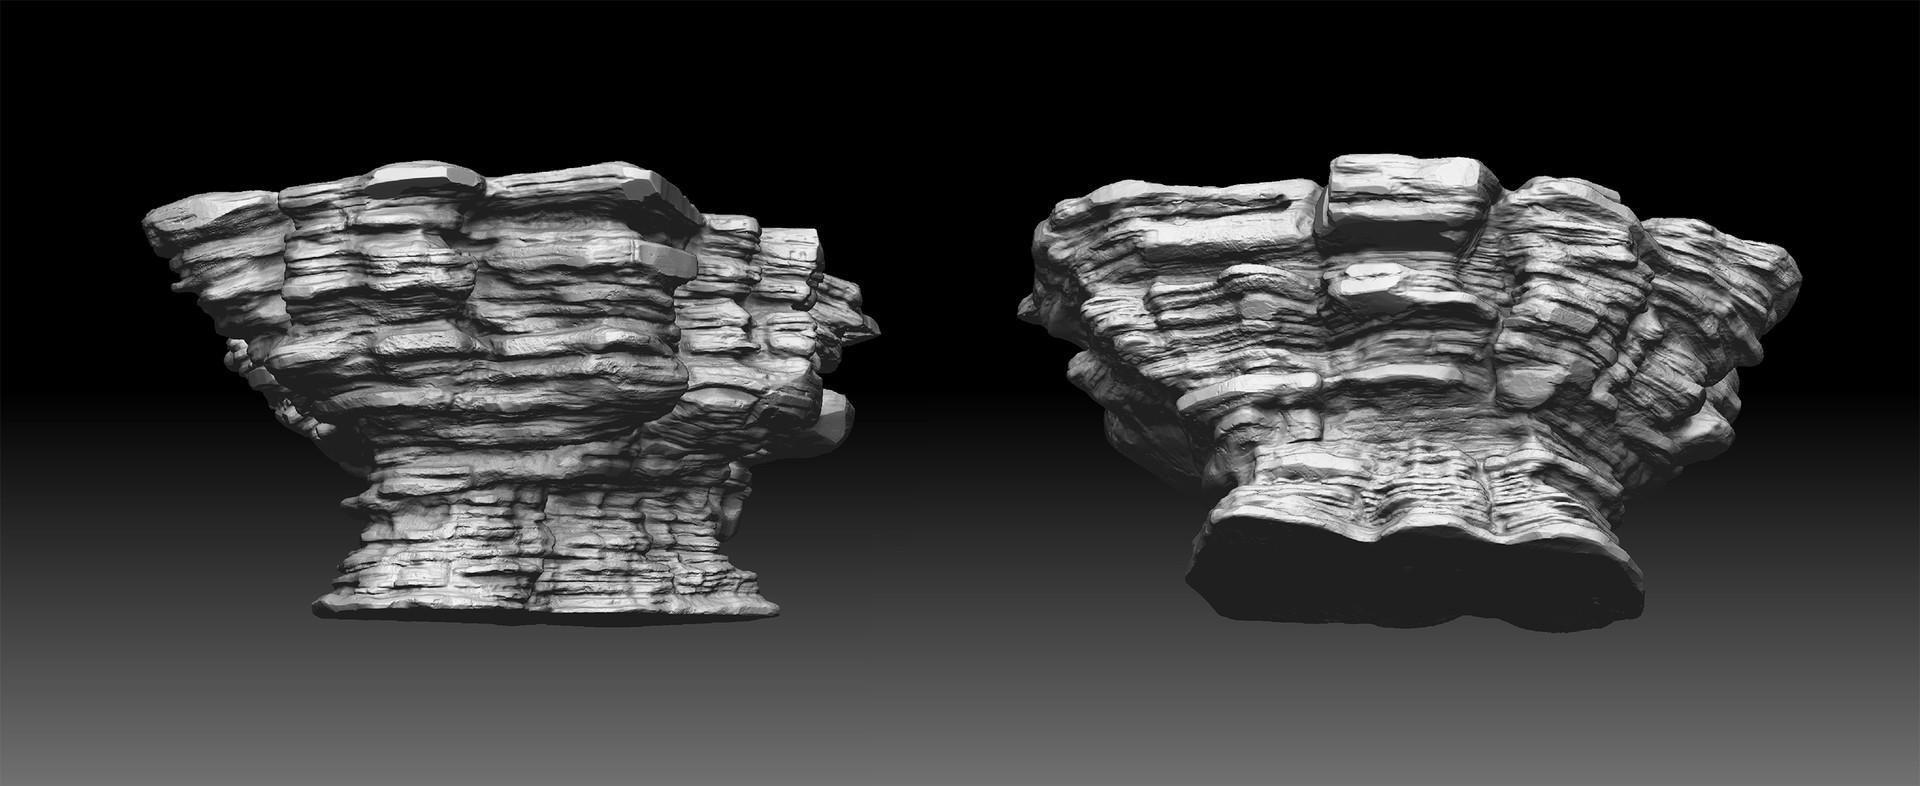 Walid k perrussel rock sculpt 1